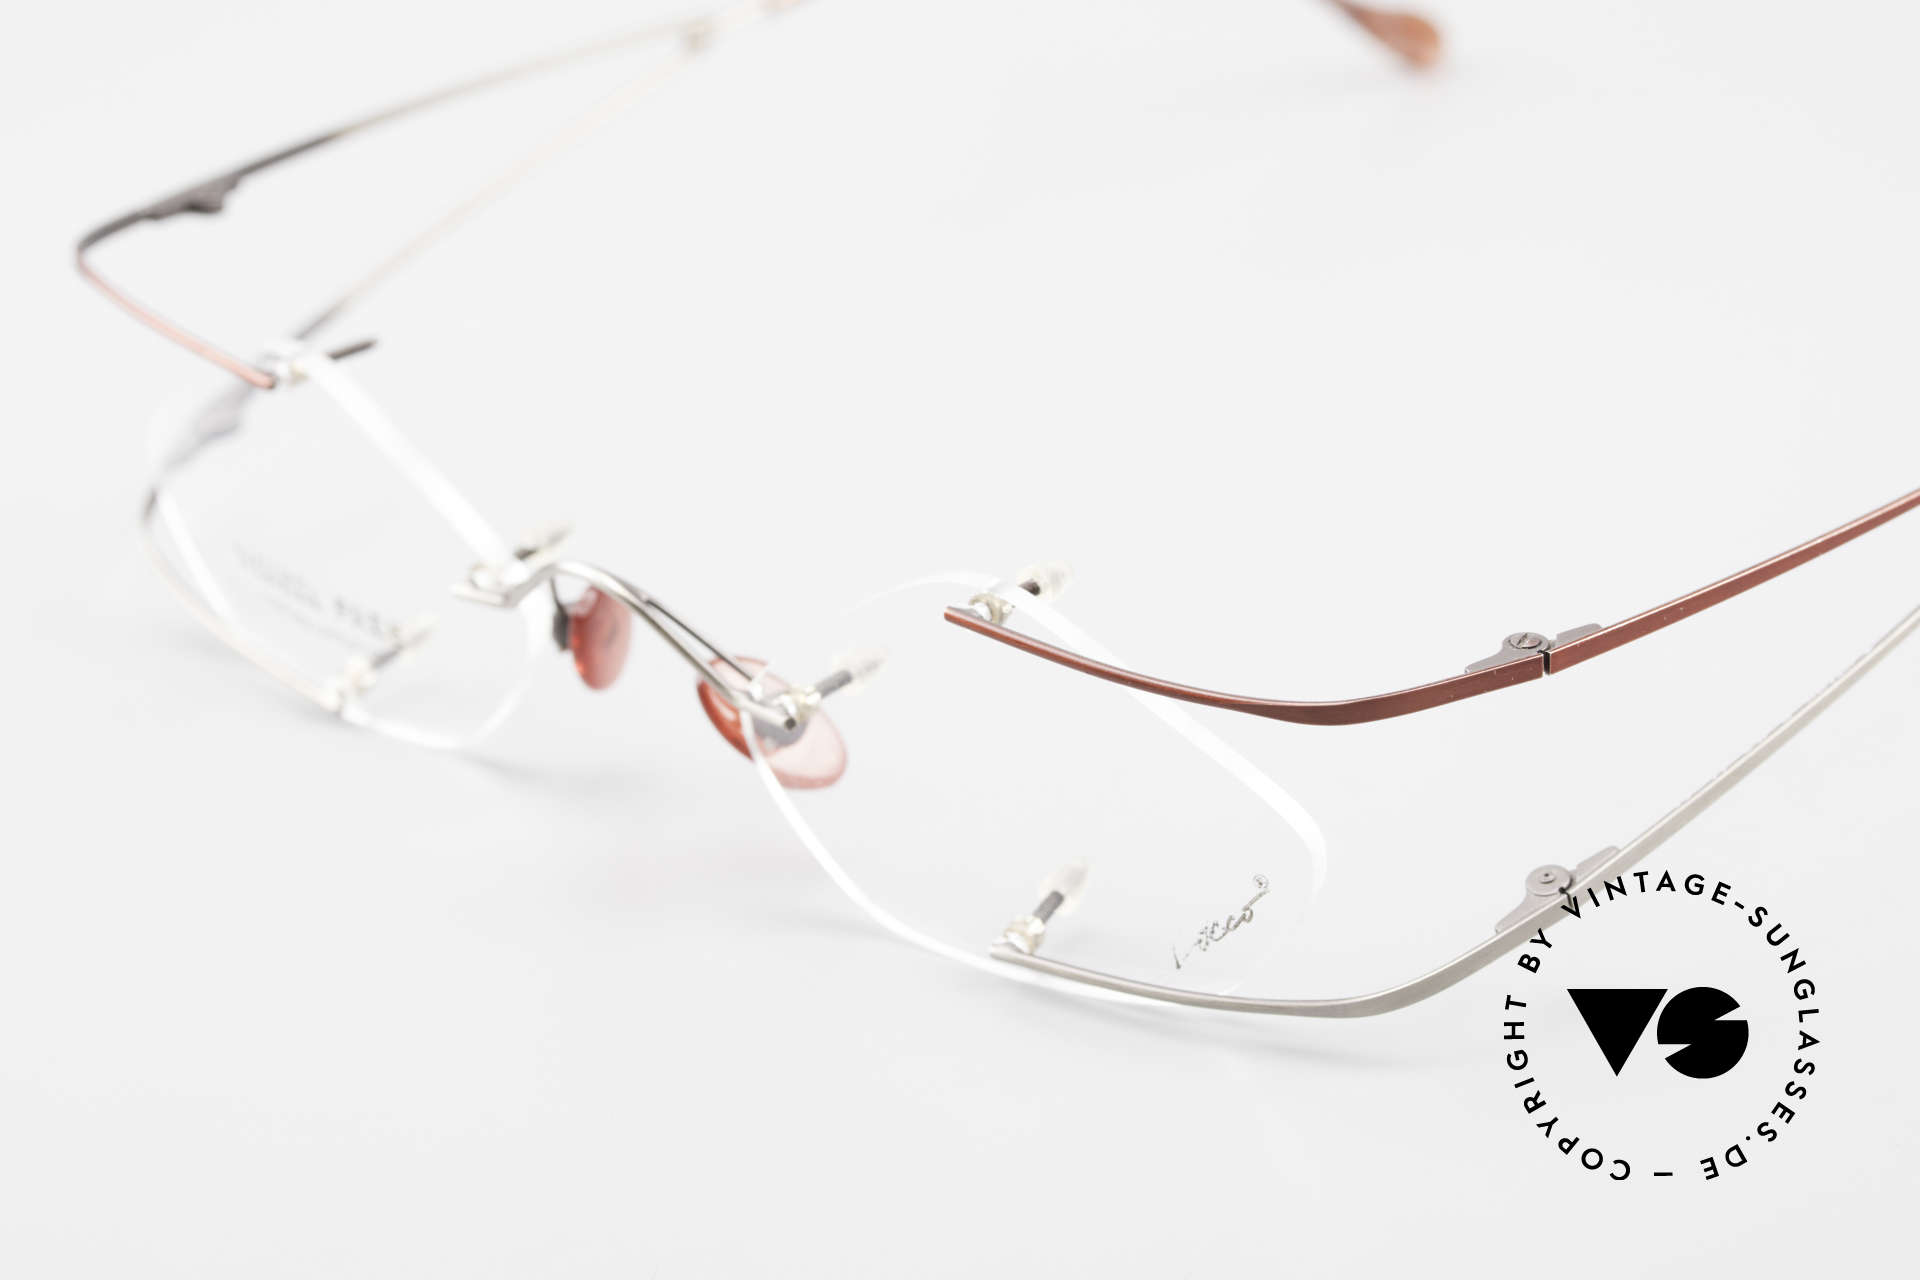 Locco Stars C Extraordinary Rimless Frame, NO RETRO eyeglasses, but an old 1990's ORIGINAL, Made for Men and Women